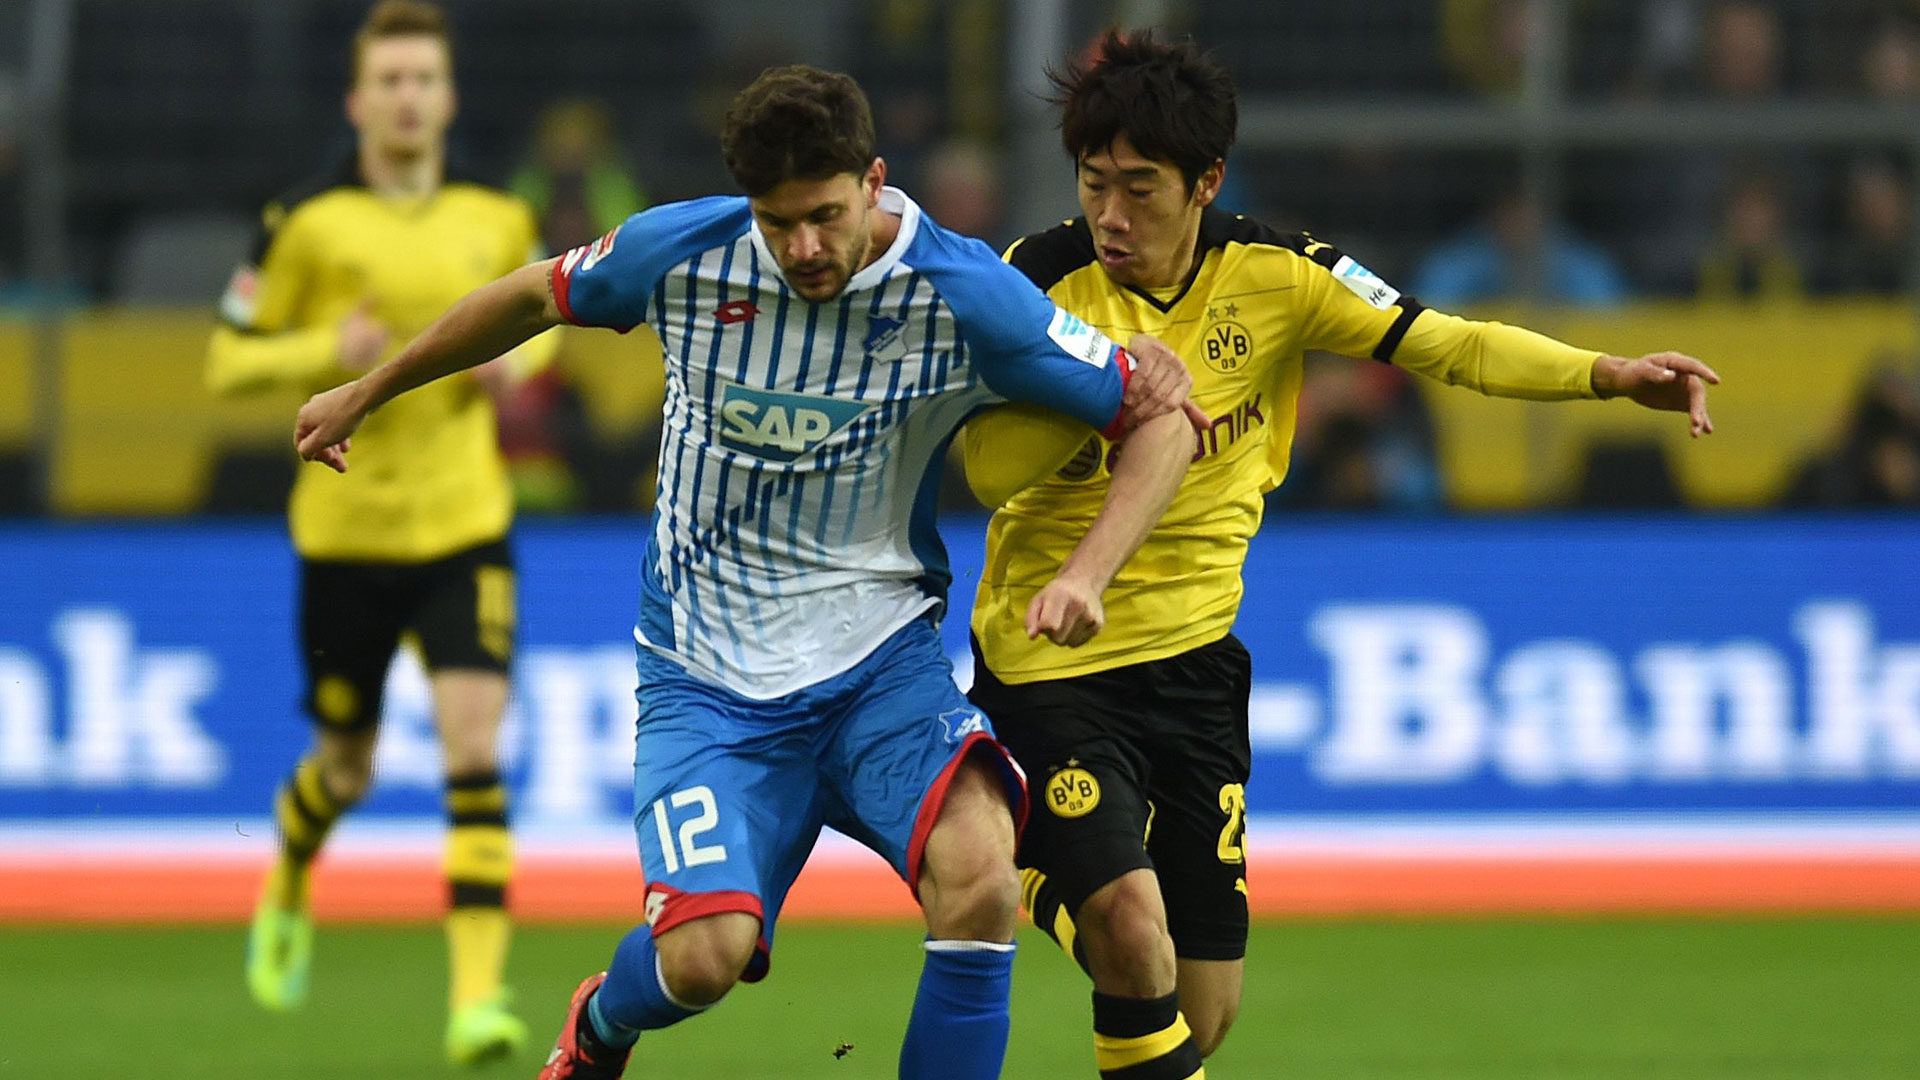 Image Result For Borussia Dortmund Vs Eintracht Frankfurt En Vivo Eliminatorias